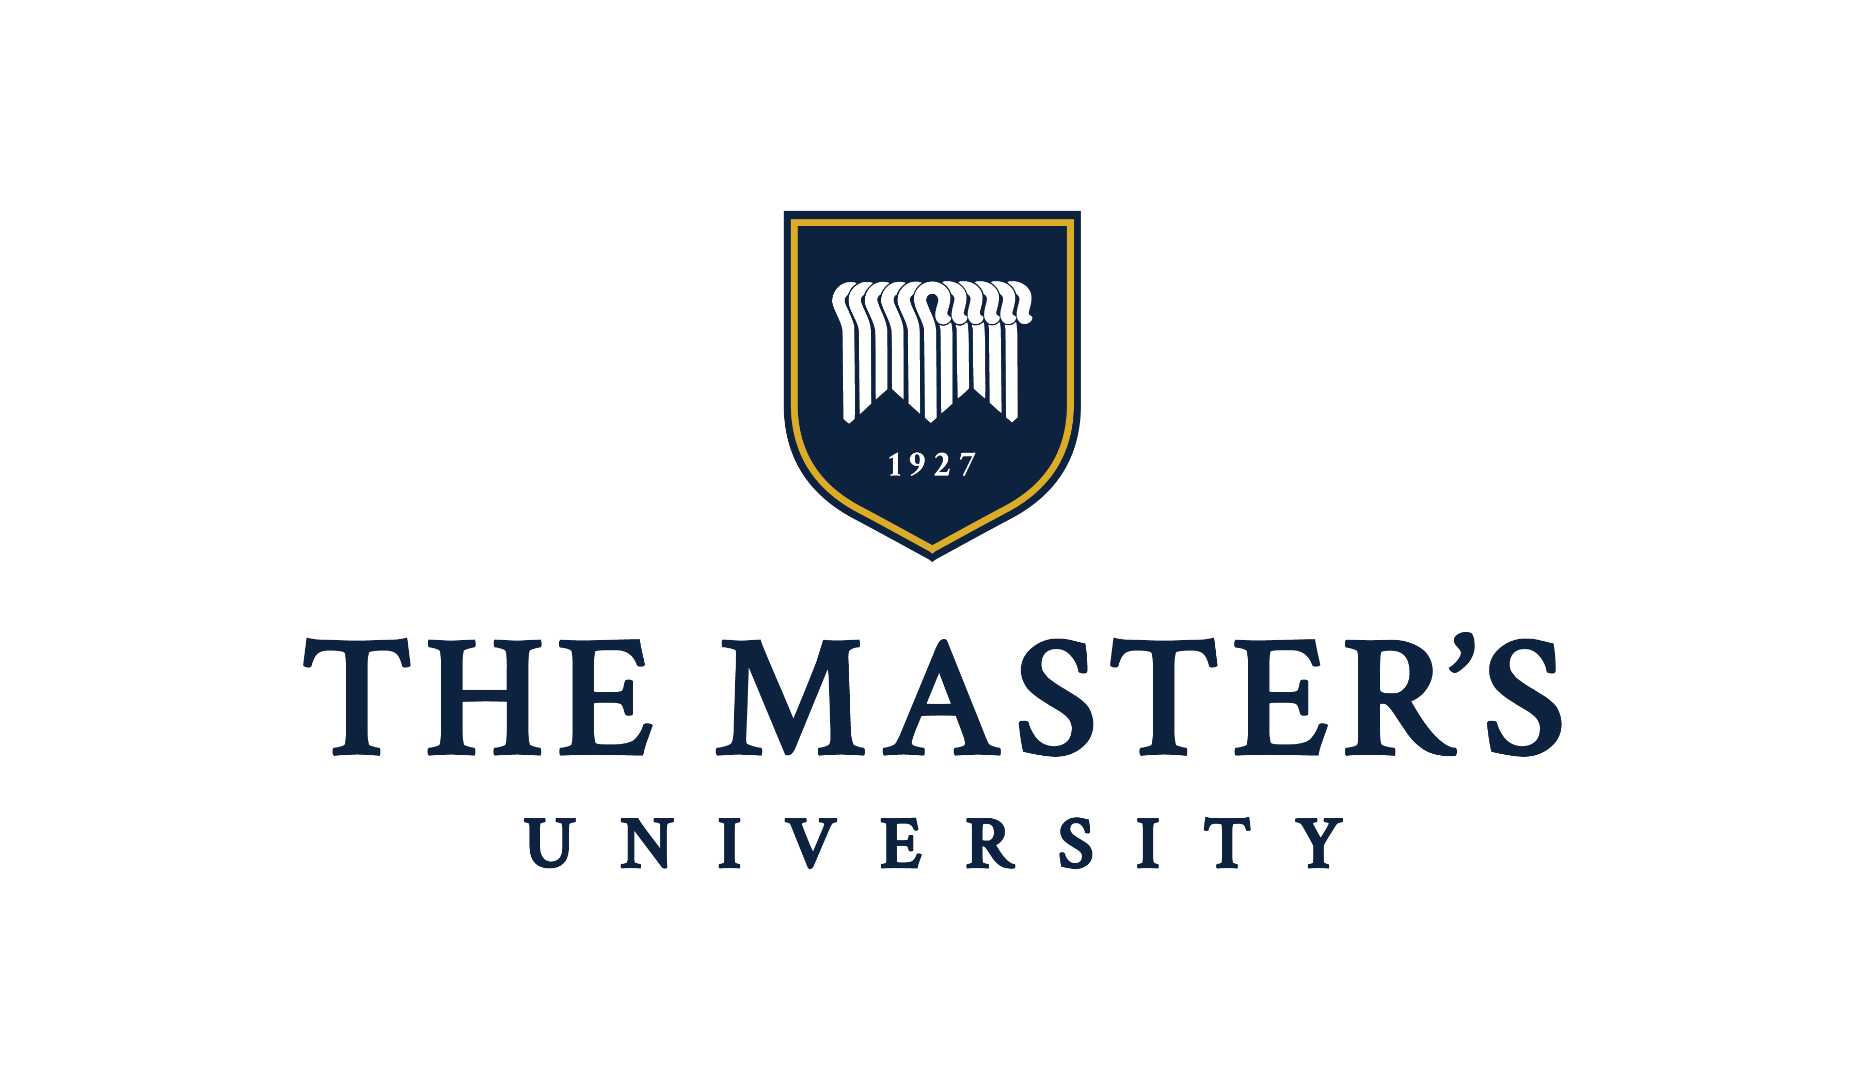 Master's University